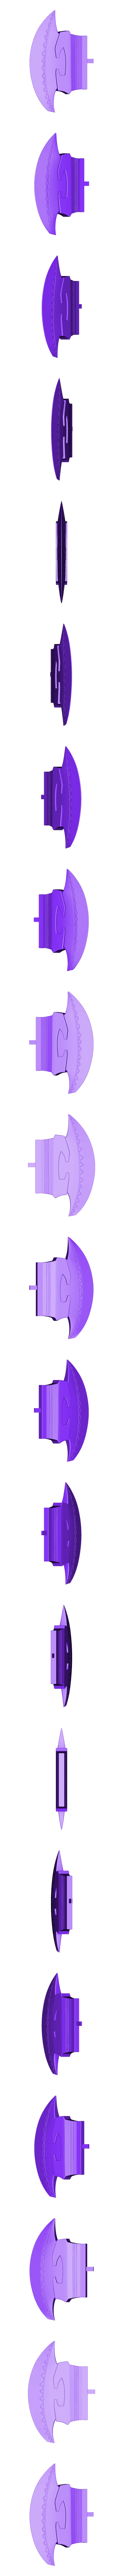 Part3.stl Download OBJ file AXE-Warhammer • Object to 3D print, Bstar3Dart